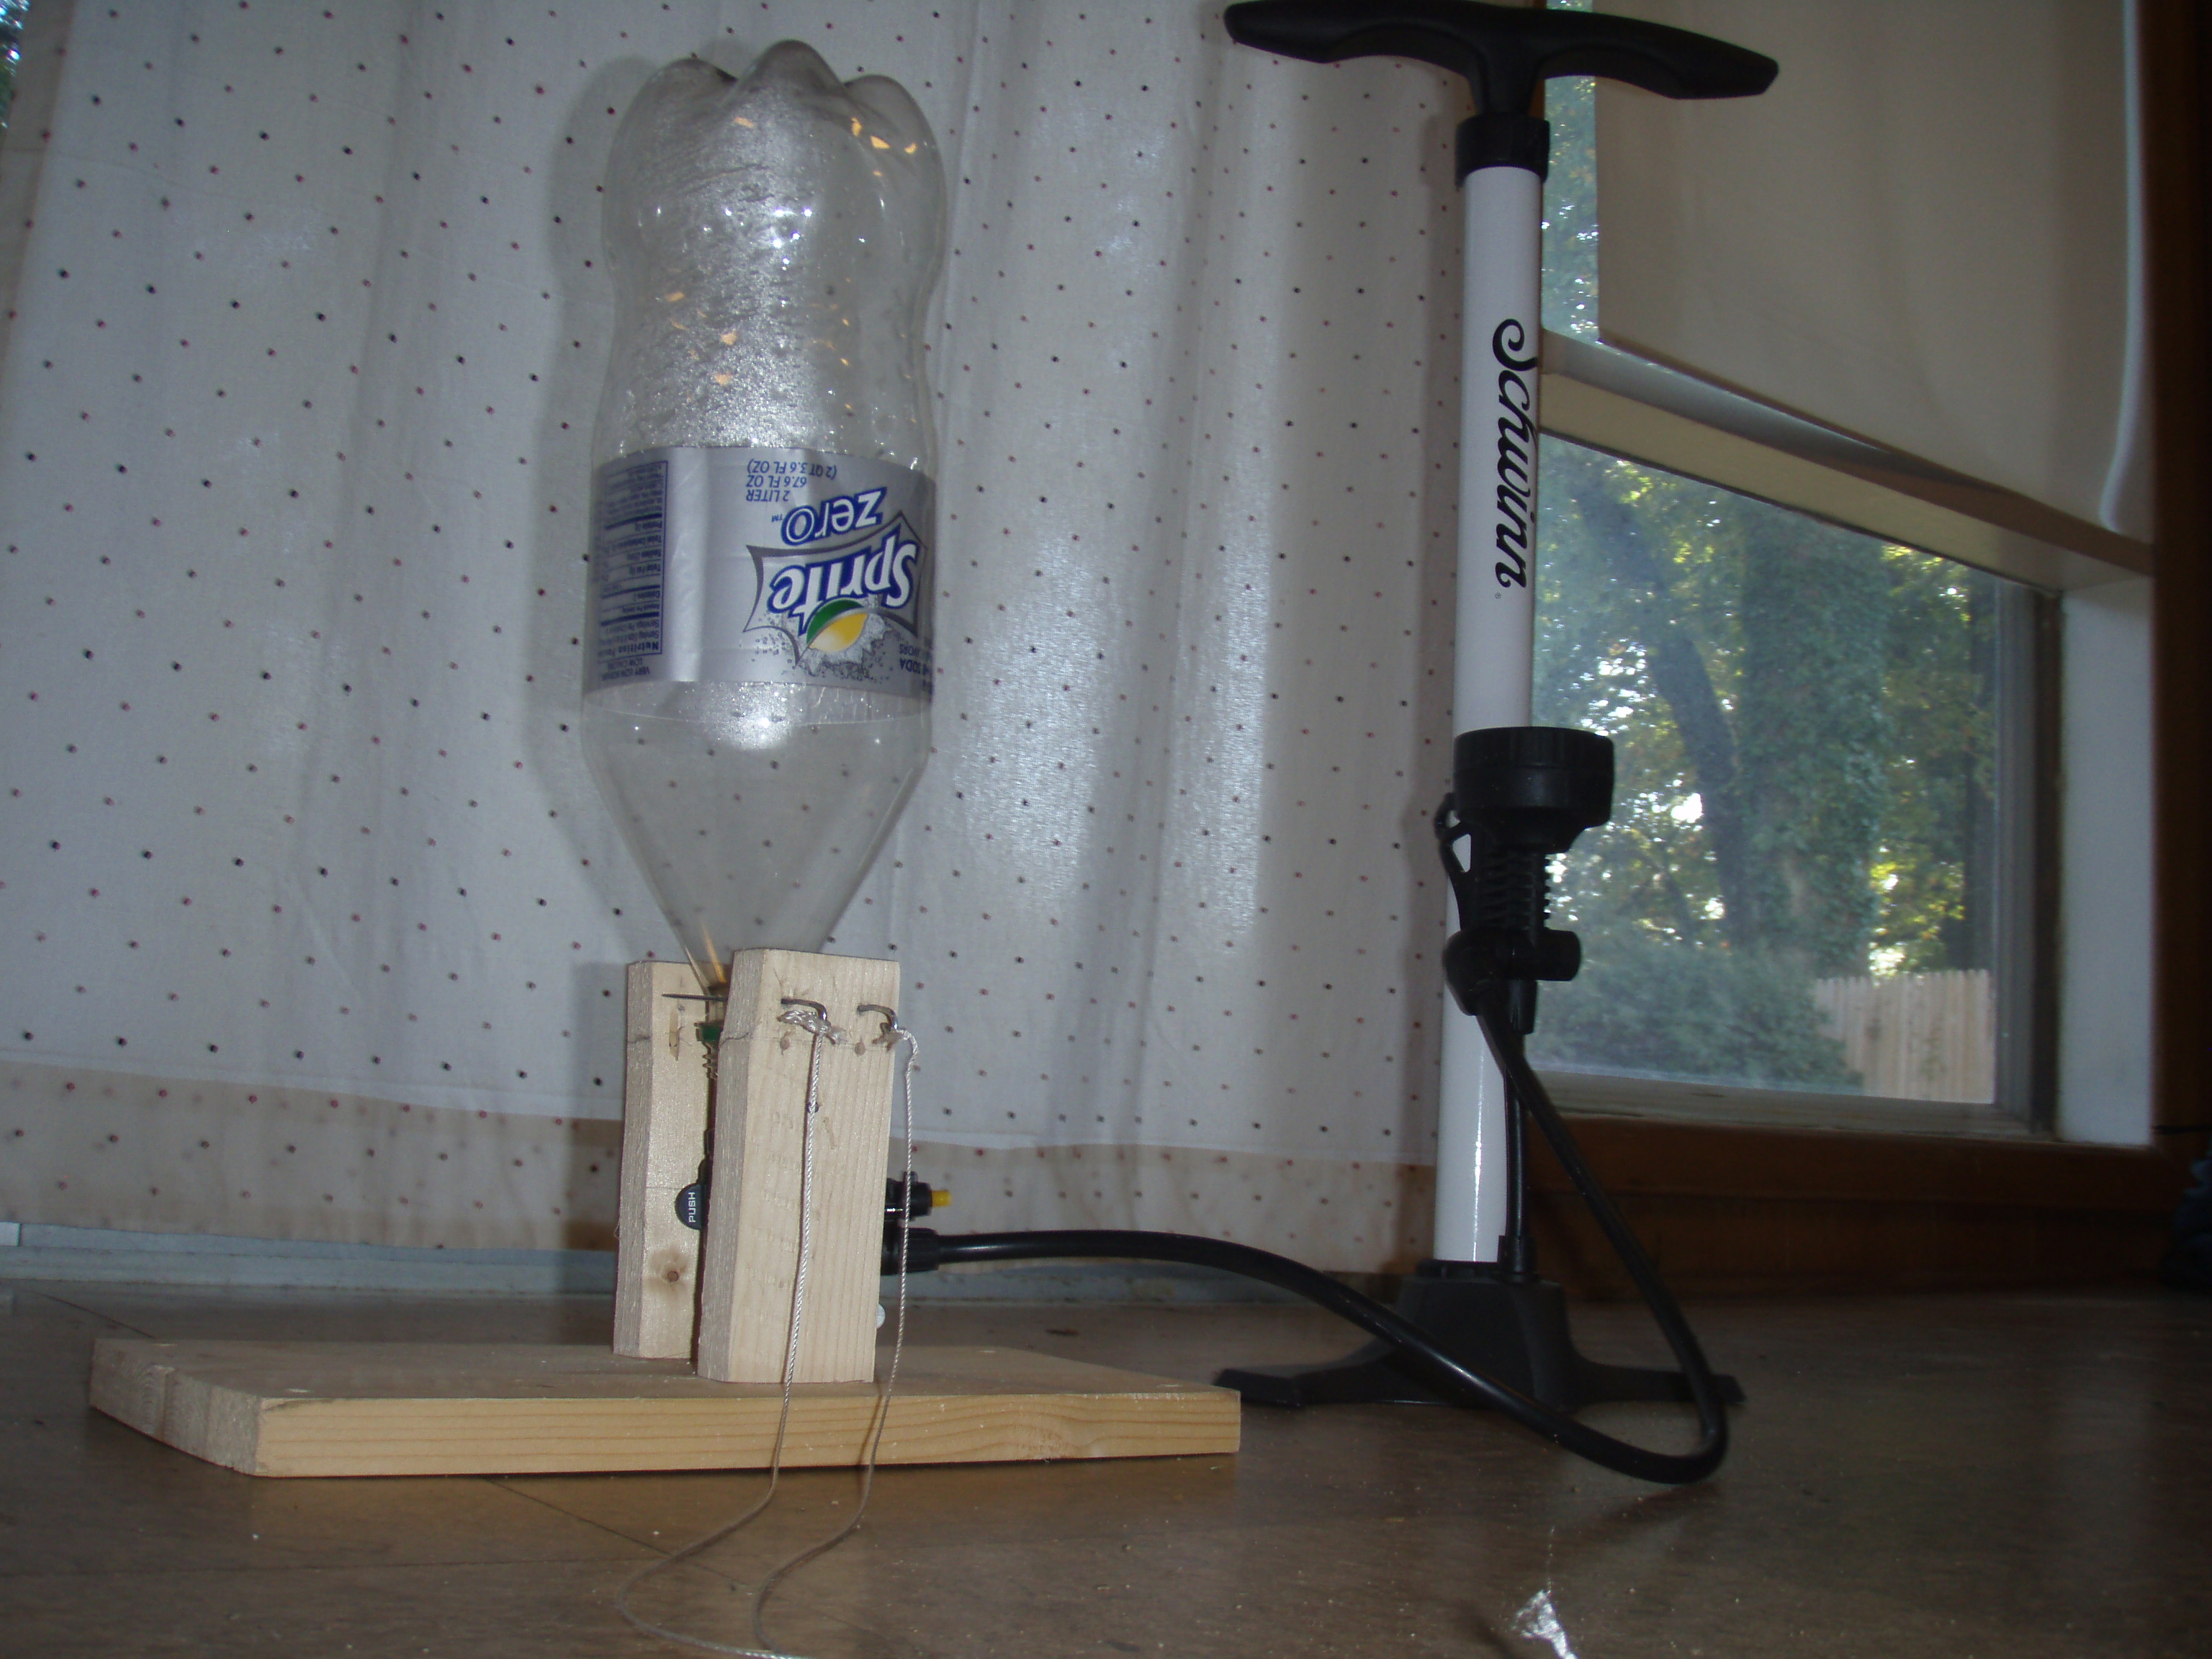 Homemade Water Rocket Launcher